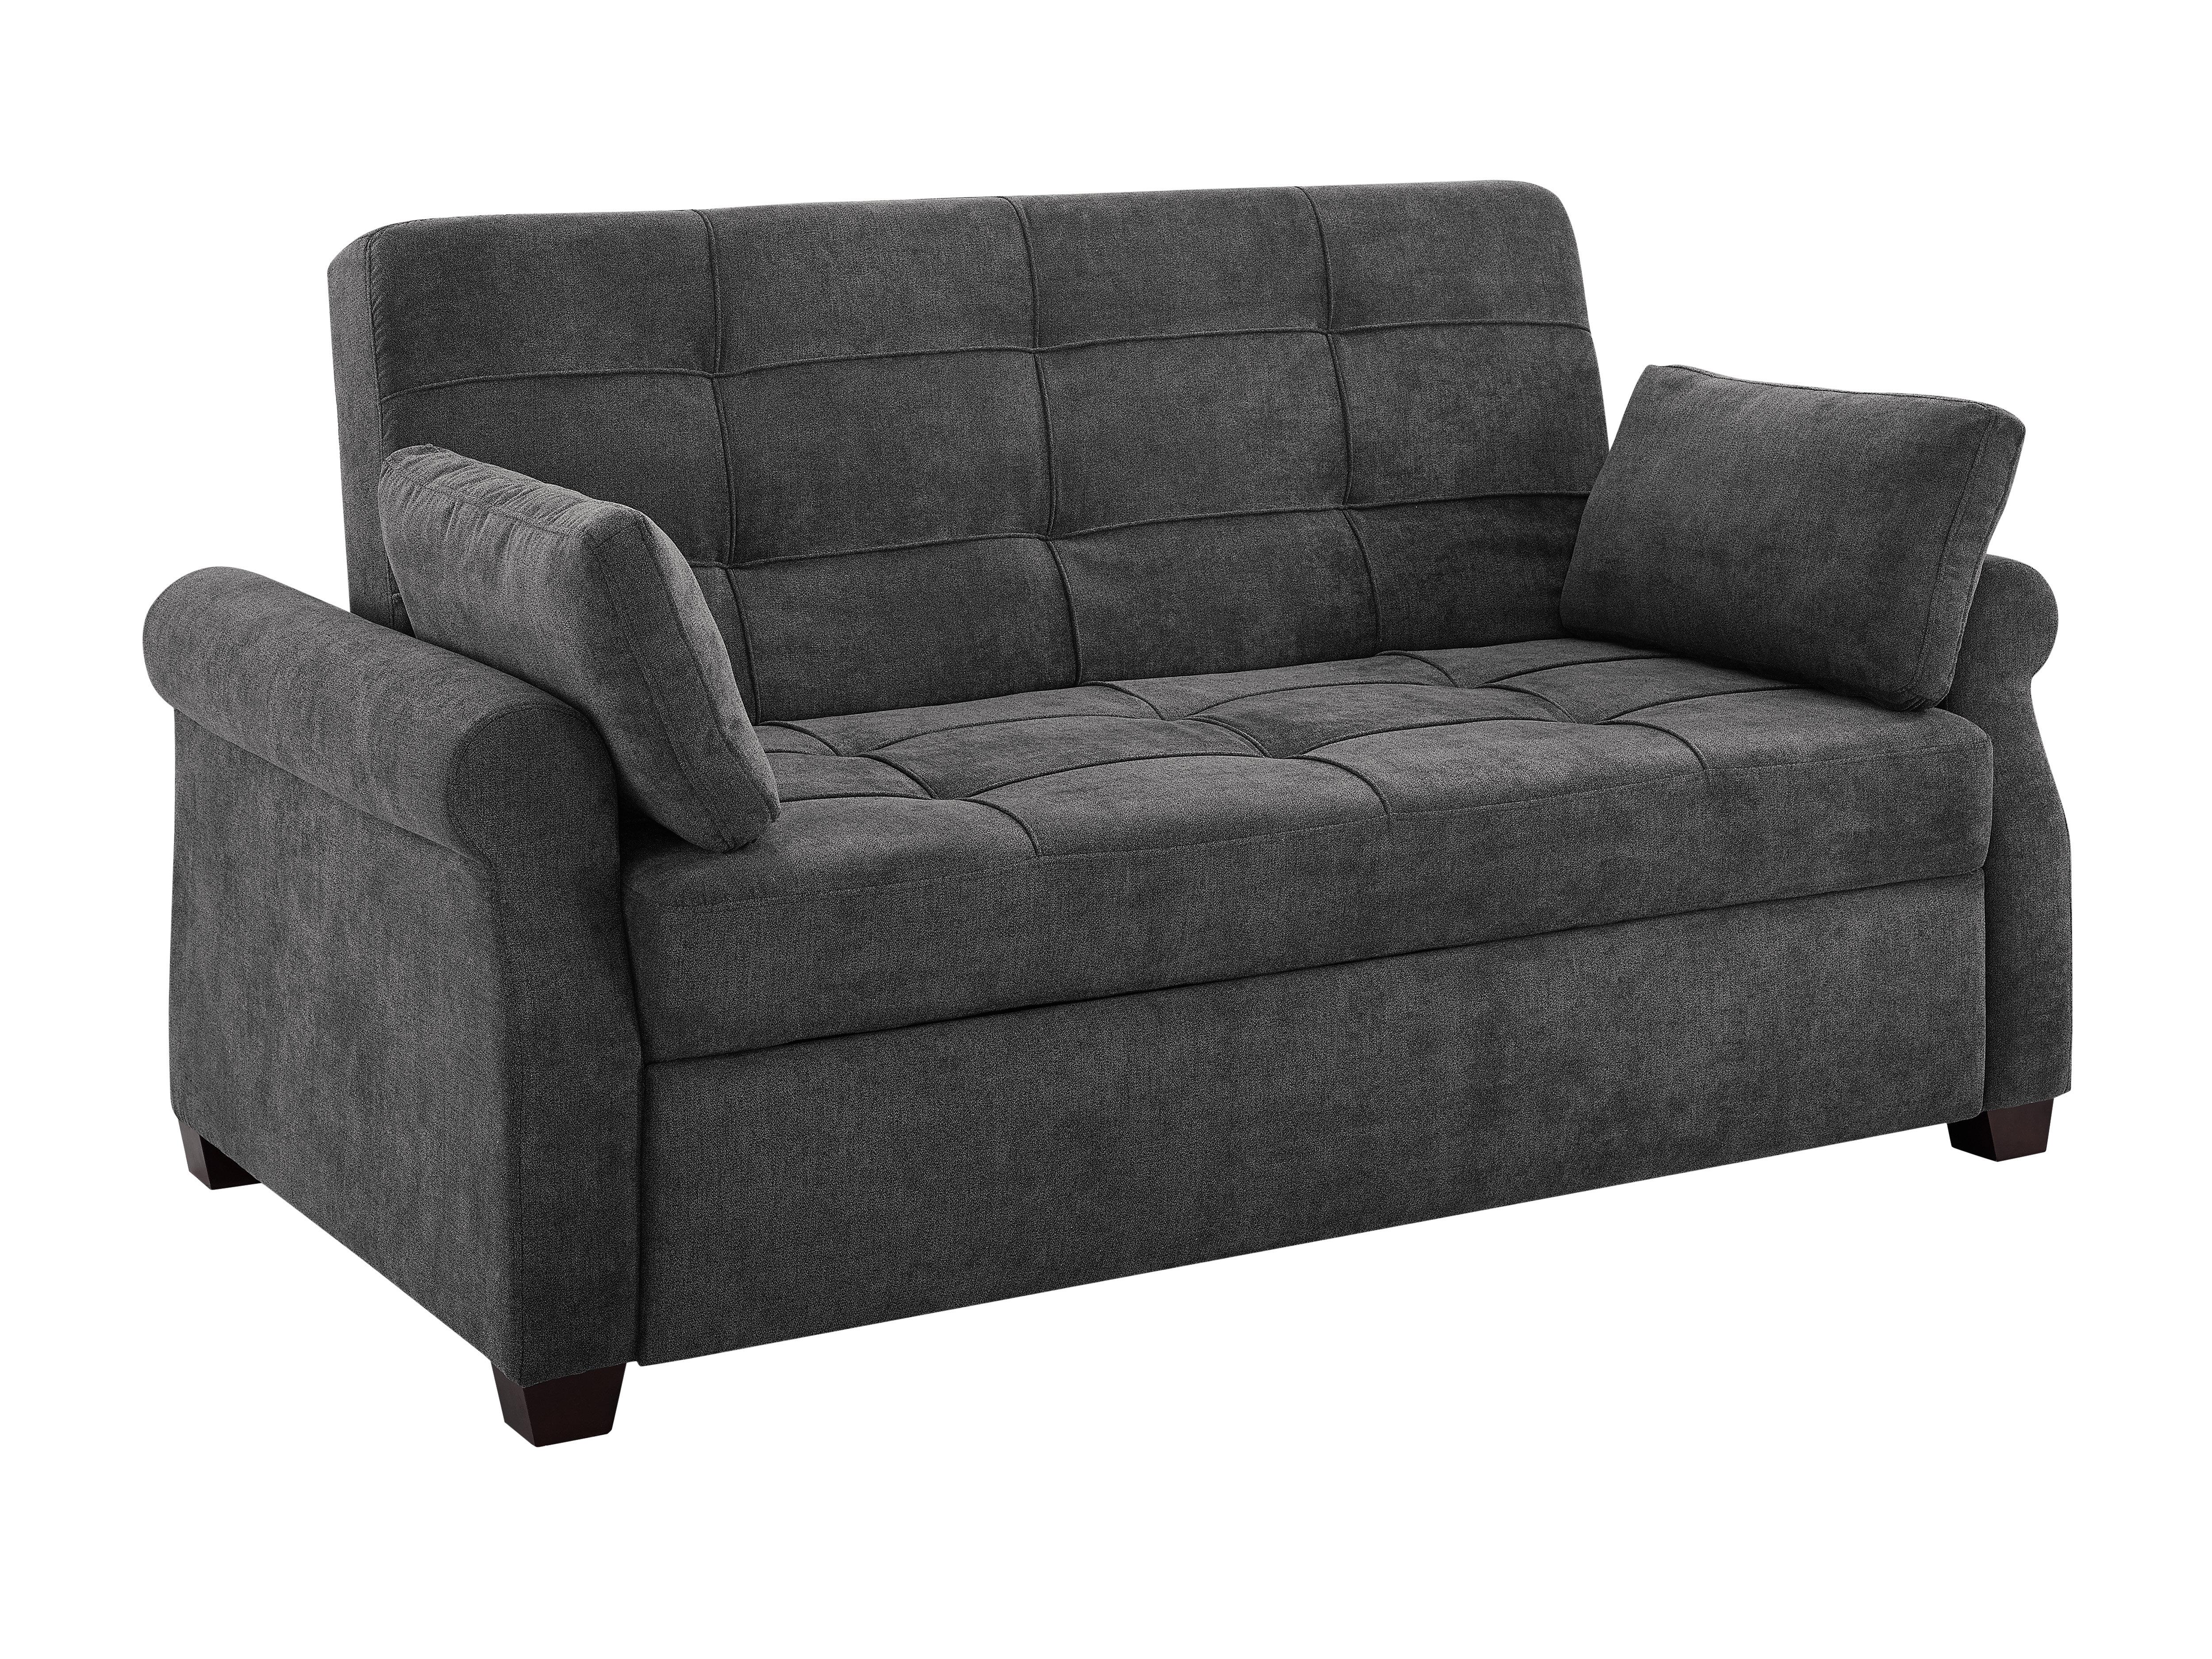 Picture of: Serta Futons Sabrina Microfiber 72 6 Rolled Arm Sofa Bed Reviews Wayfair